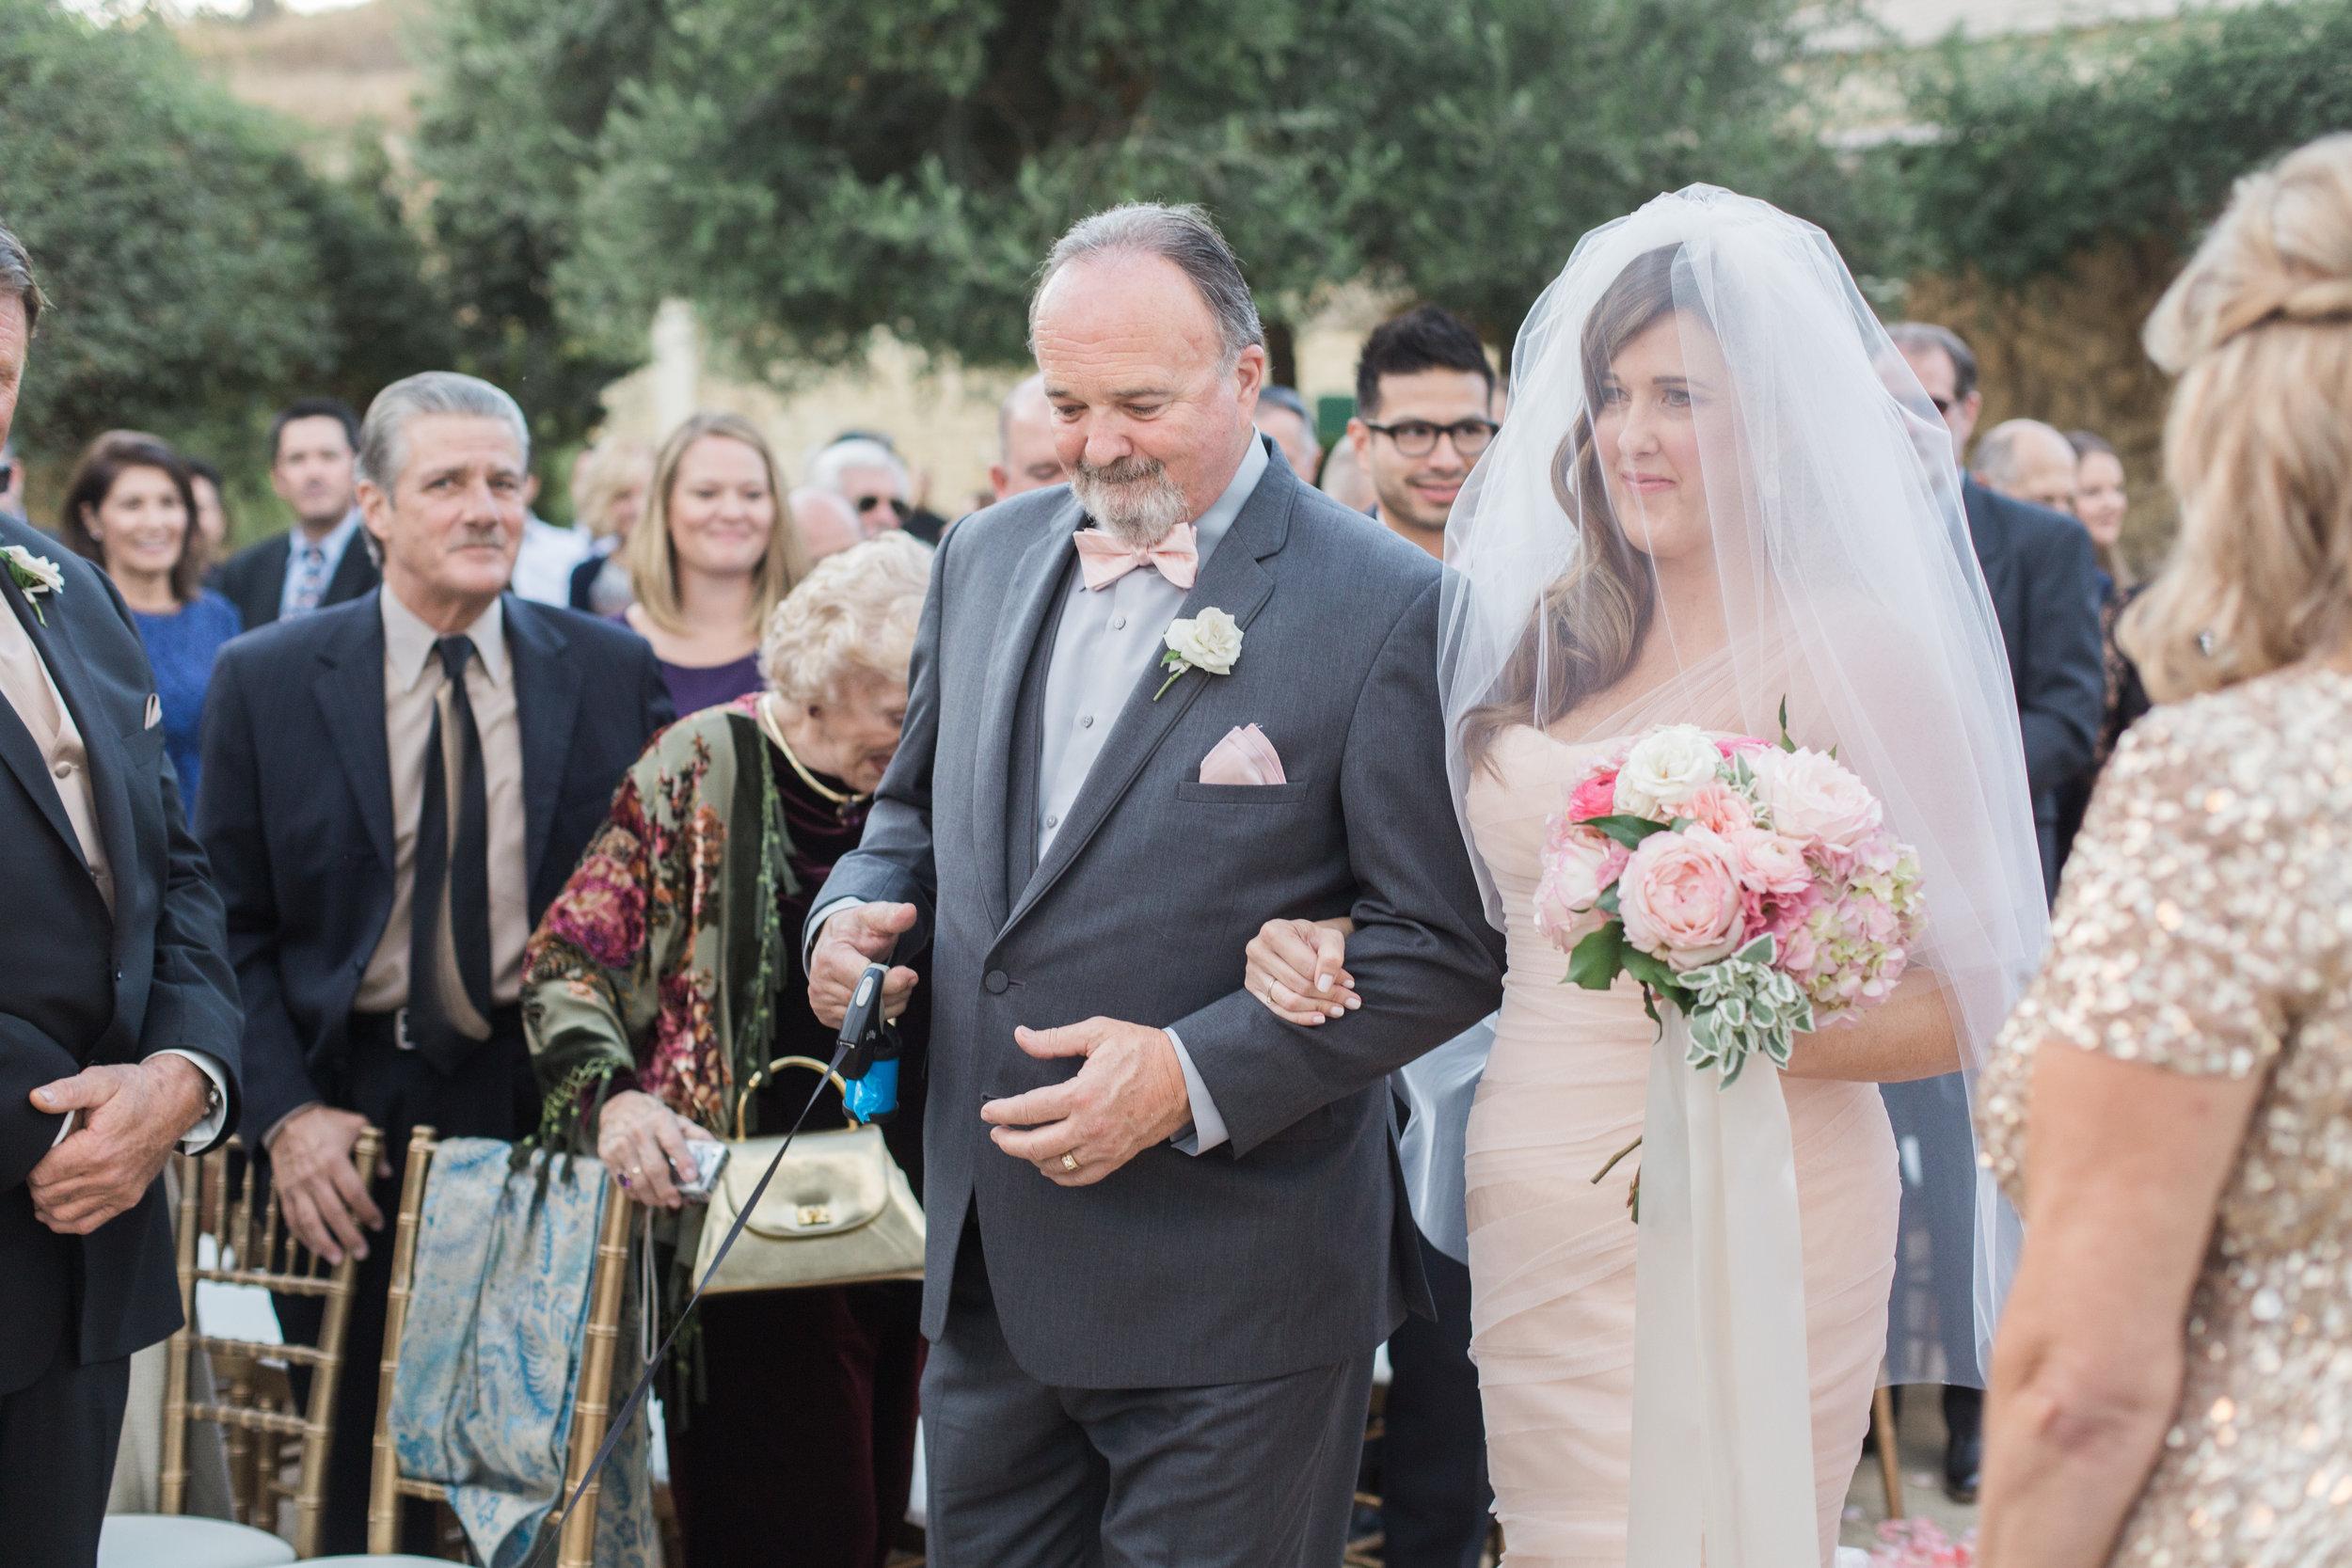 www.santabarbarawedding.com | Molly + Co | Sunstone Winery | Jill + Co Events | Bella Vista Design | Father Walking Bride Down the Aisle